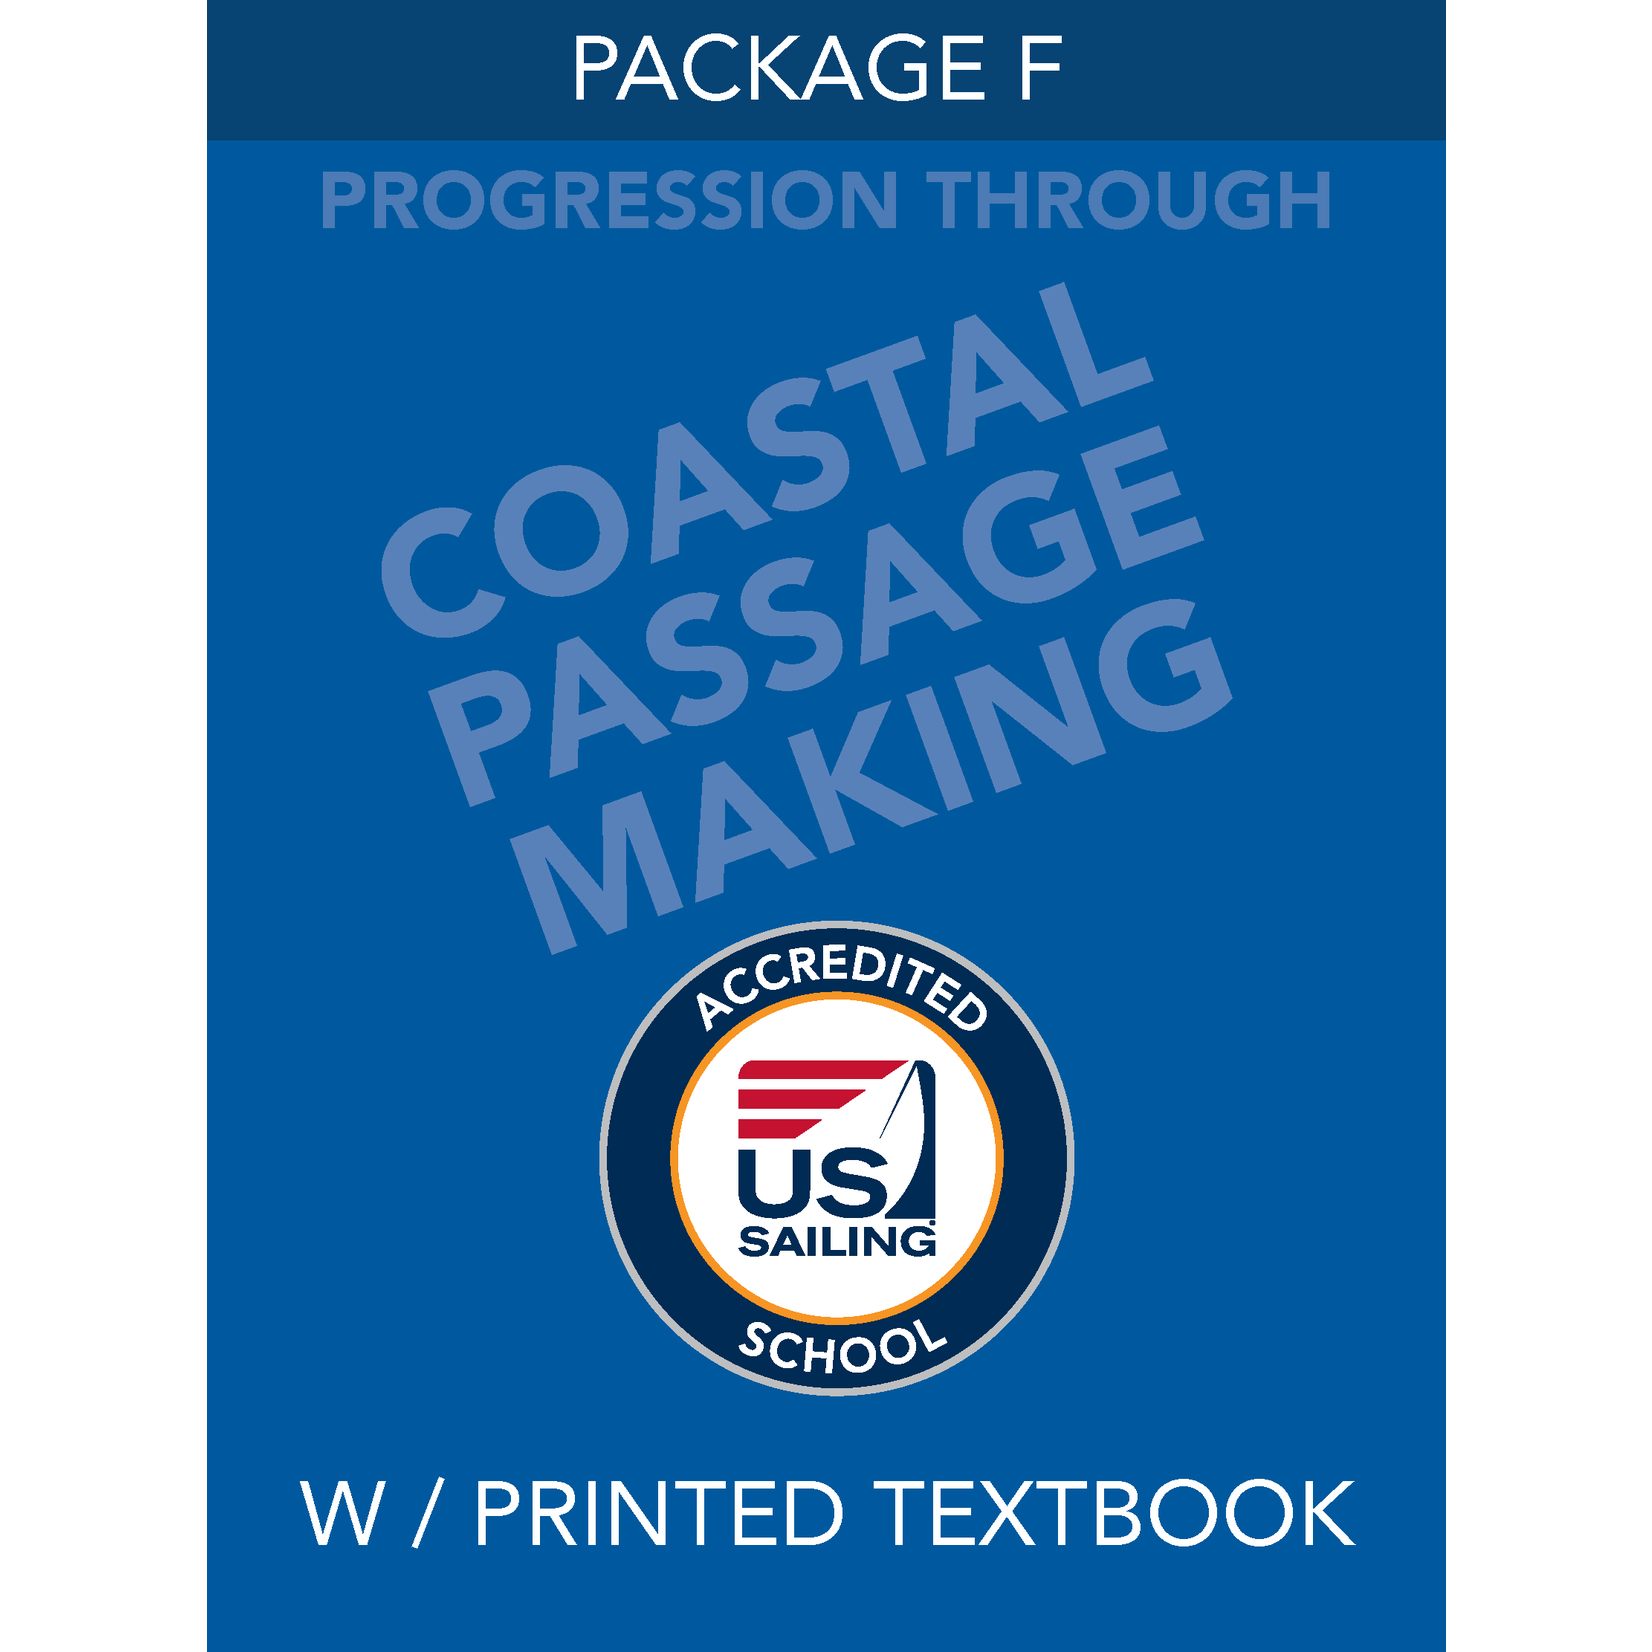 Package F - Coastal Passage Making